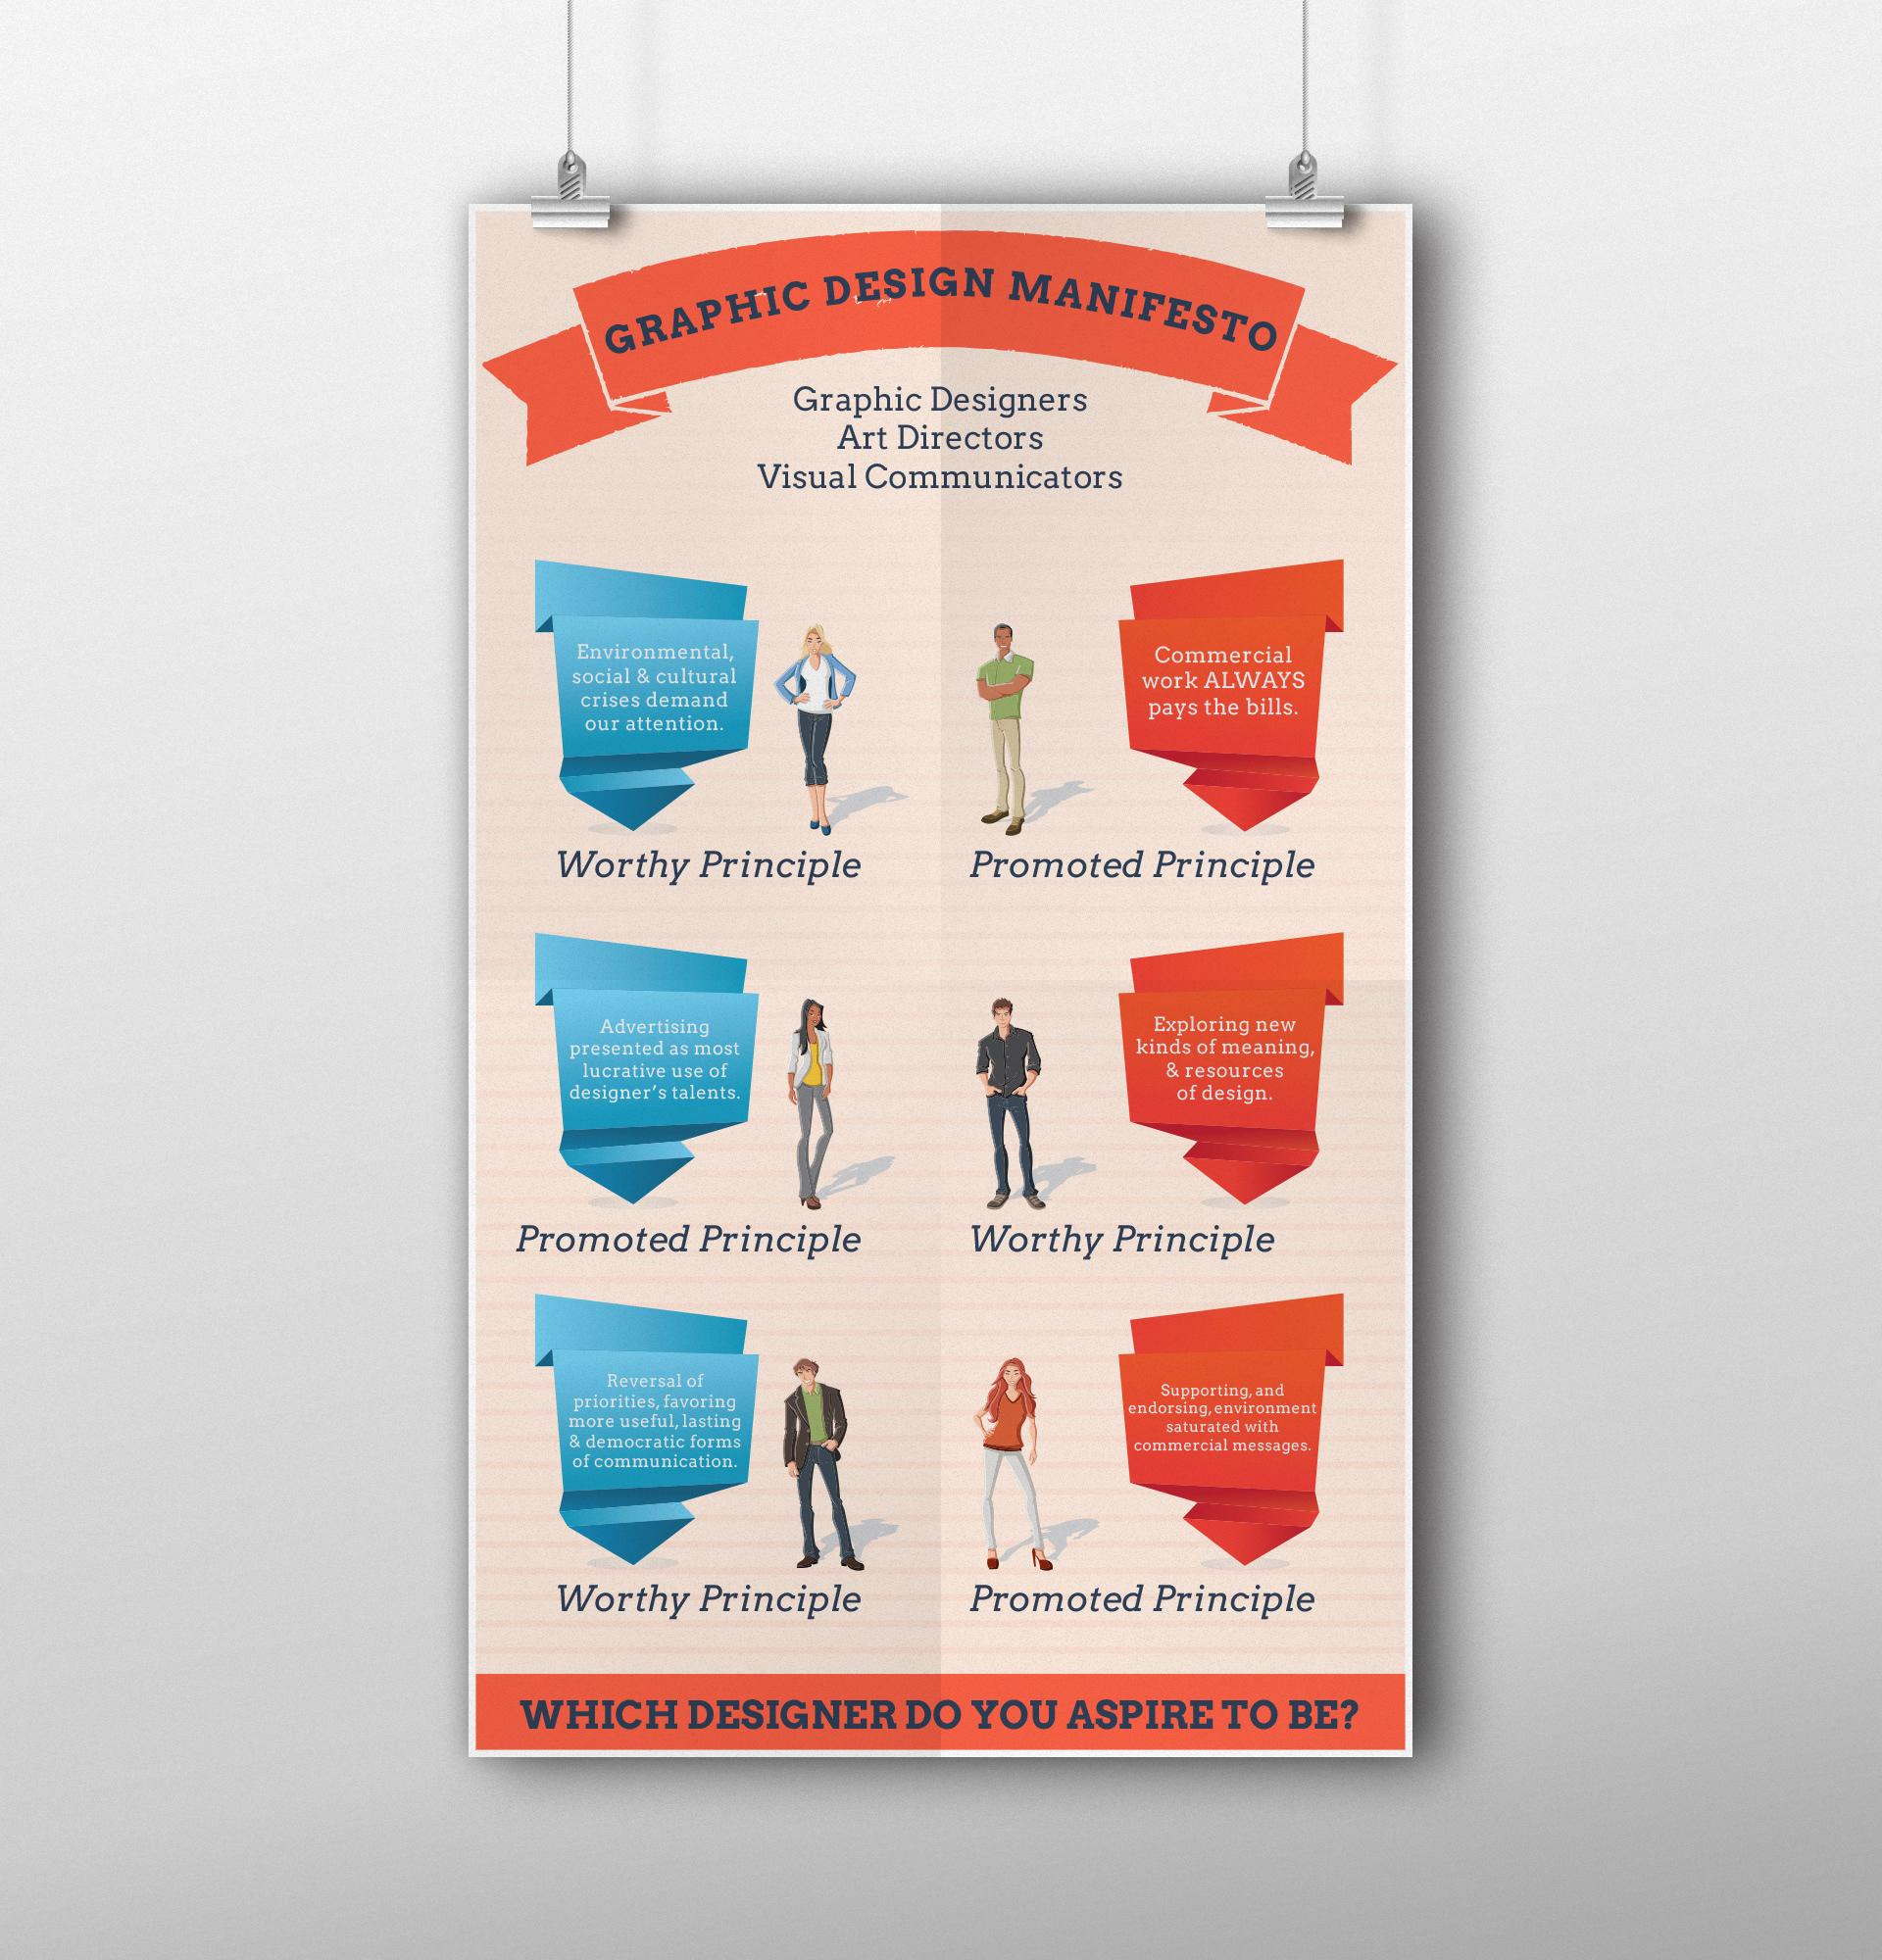 xolani radebe design infographic poster design